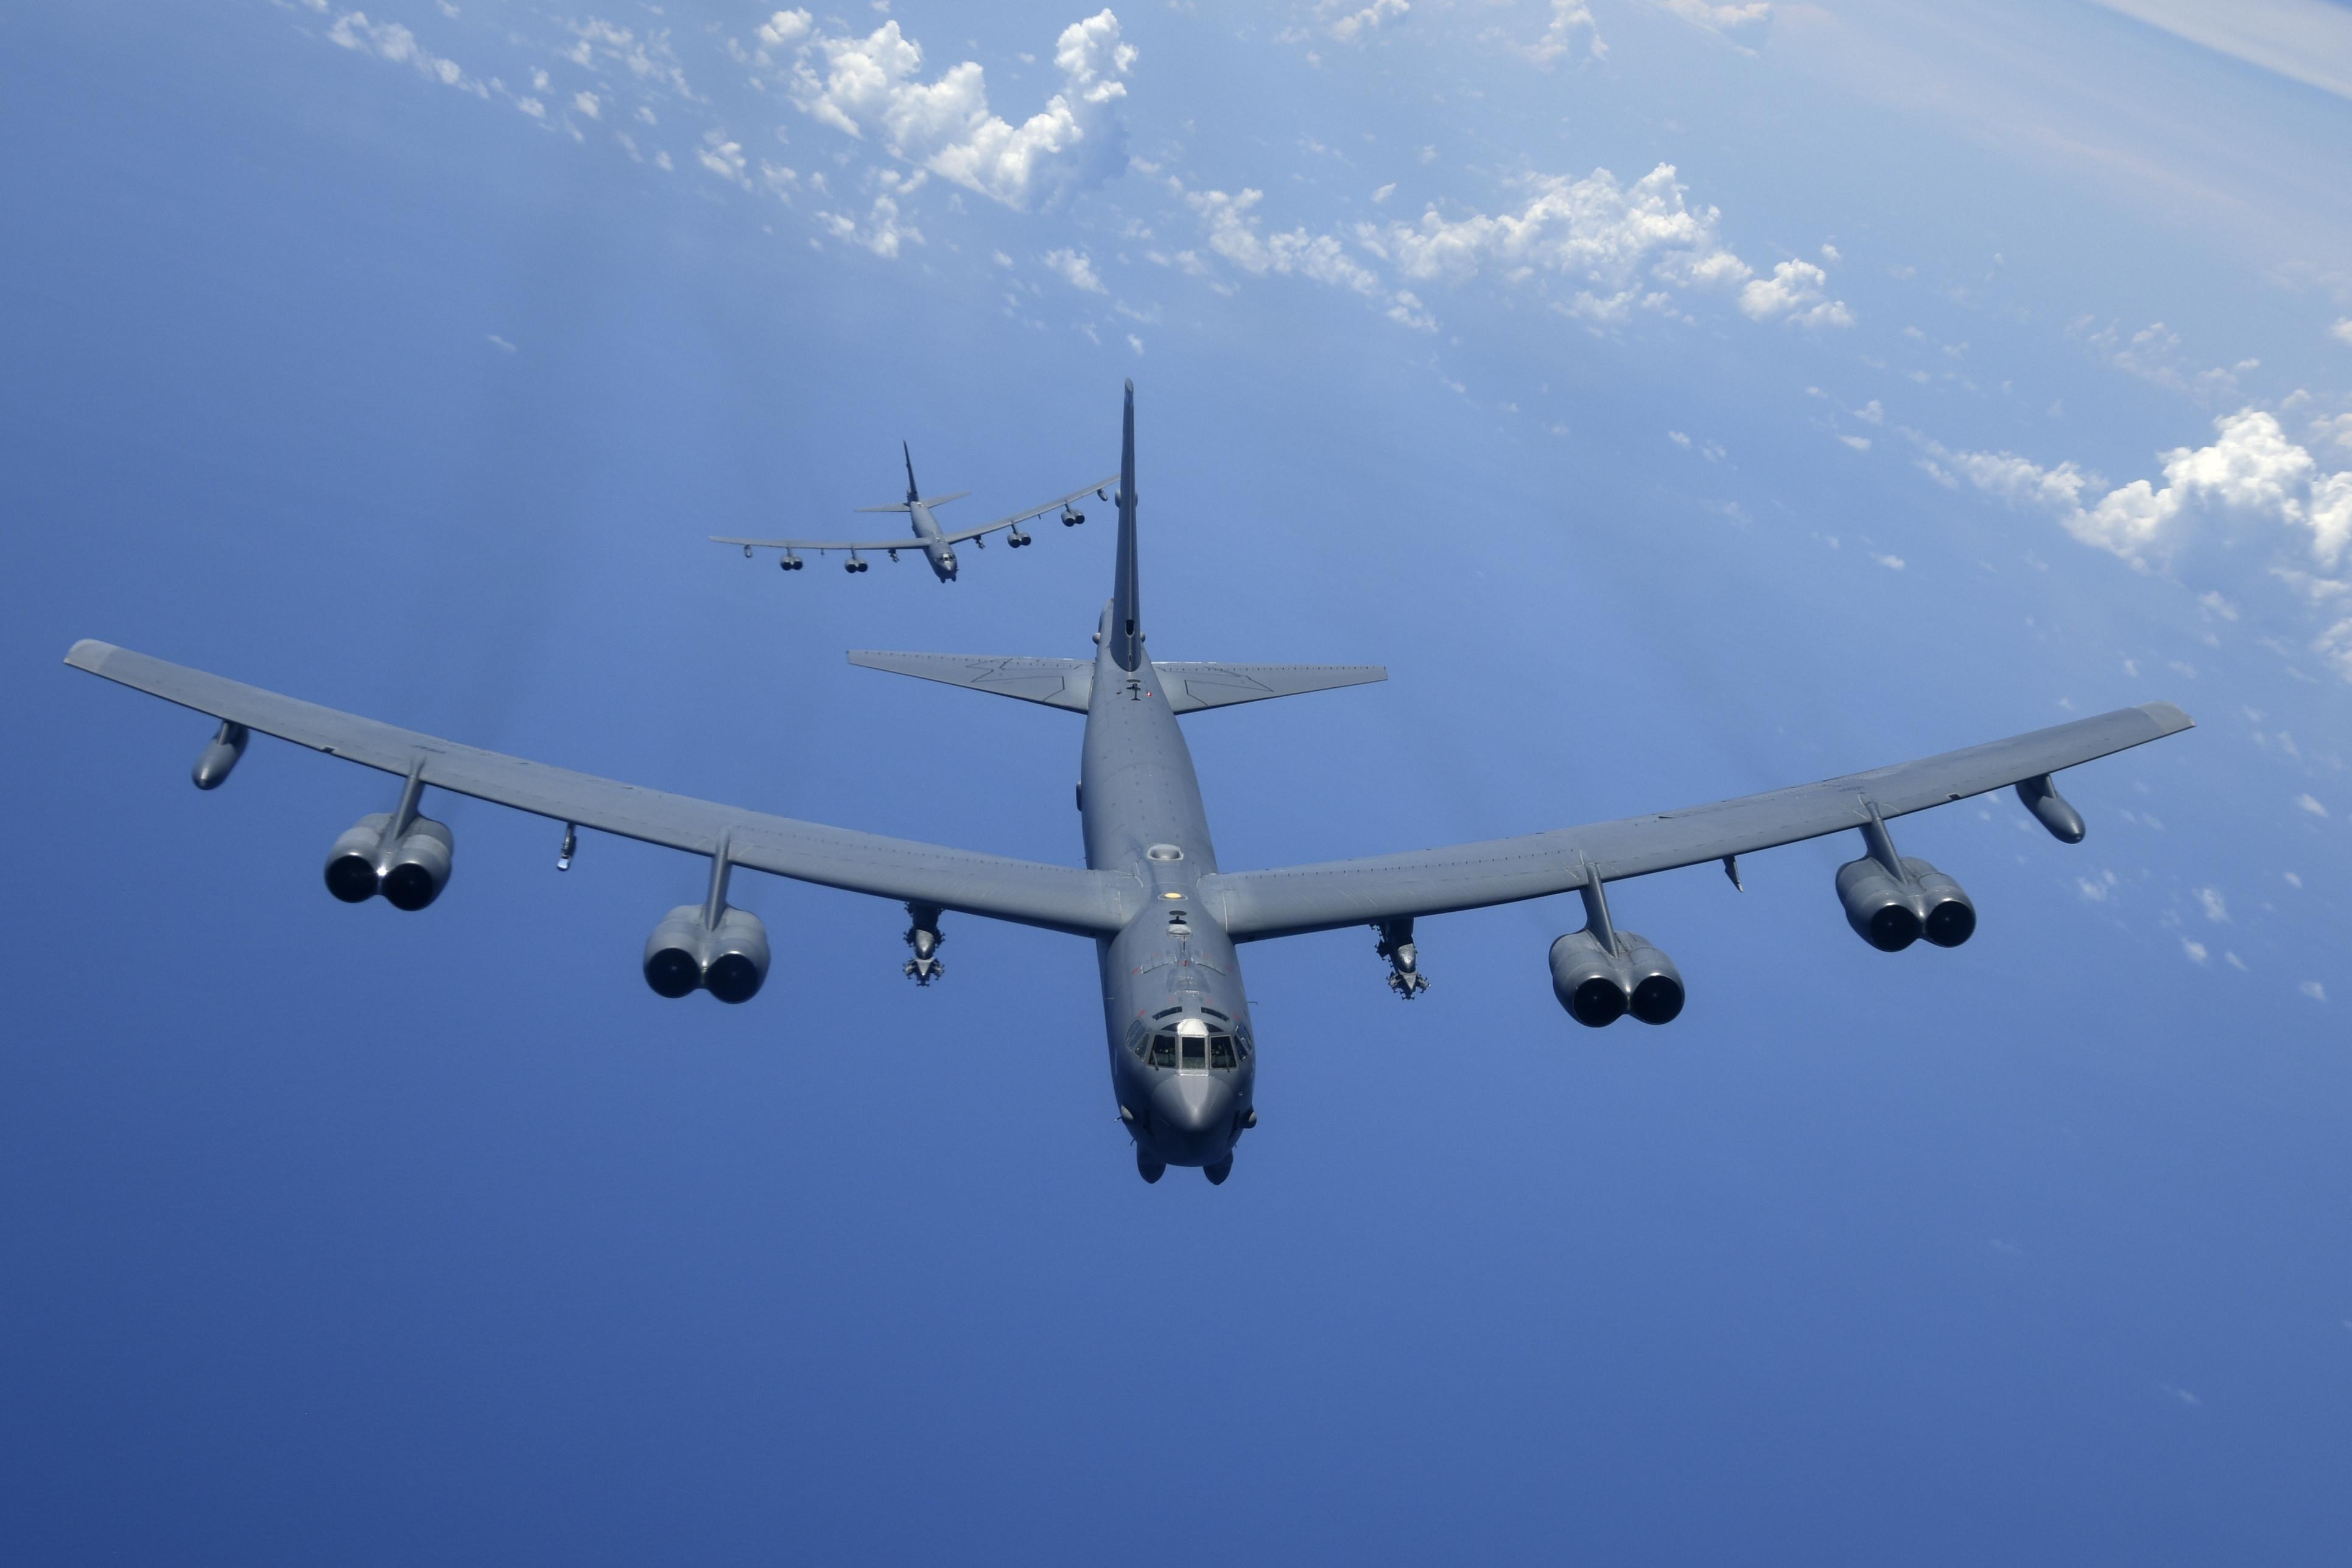 "<p>Фото © Flickr / <a href=""https://www.flickr.com/photos/compacflt/42909027275/"" target=""_self"">U.S. Pacific Fleet</a></p>"